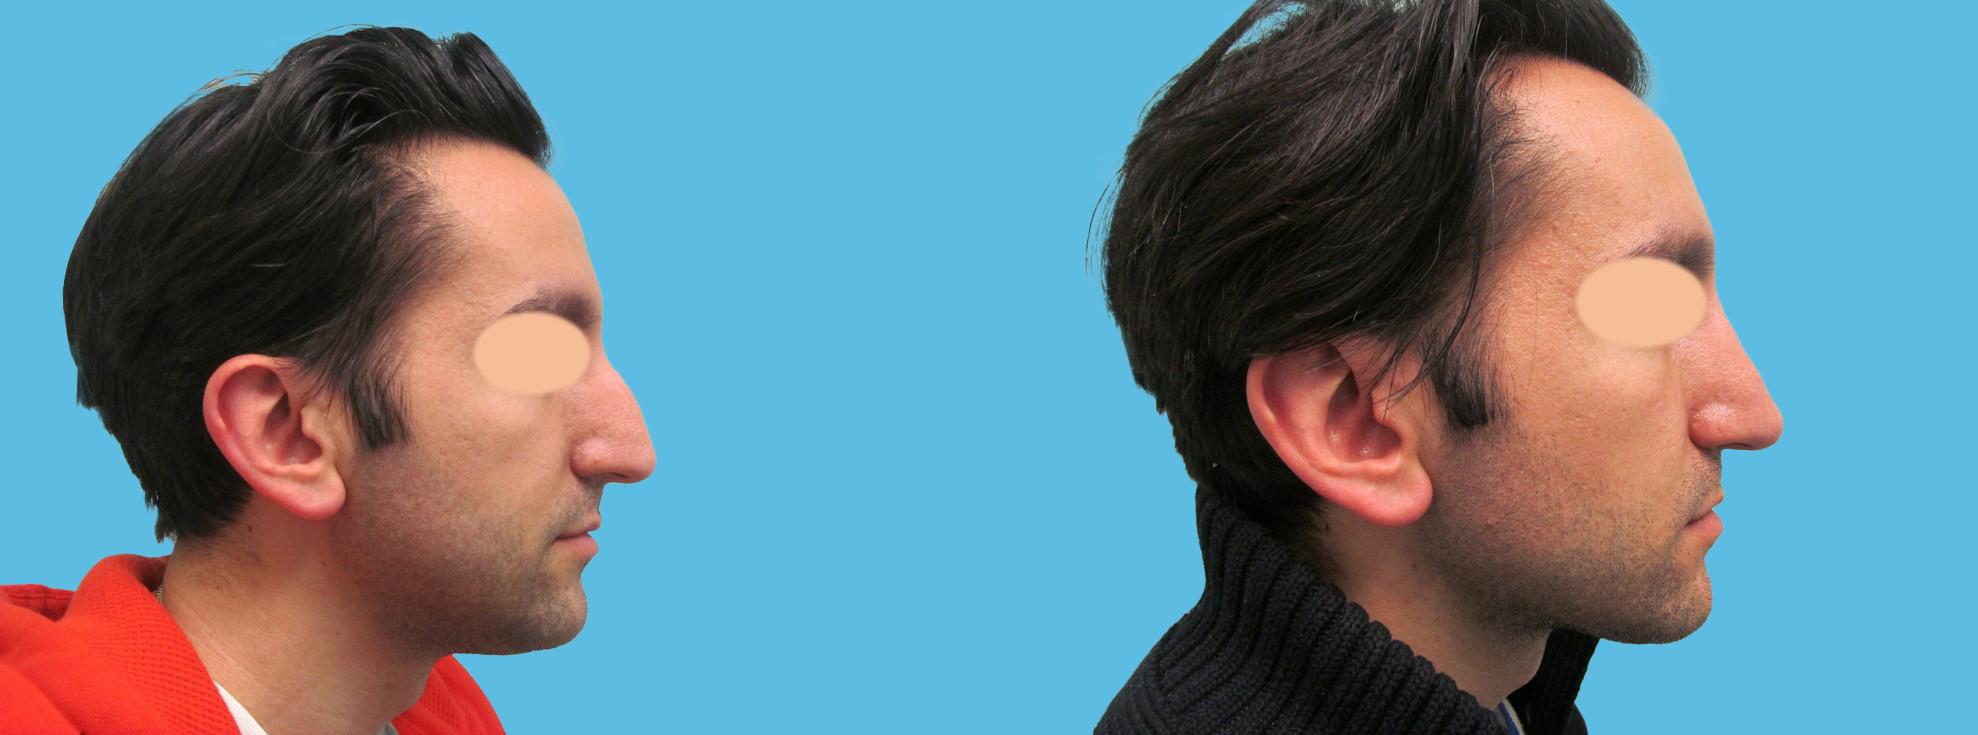 1 year rhinoplasty (long nose, high radix, angular features)